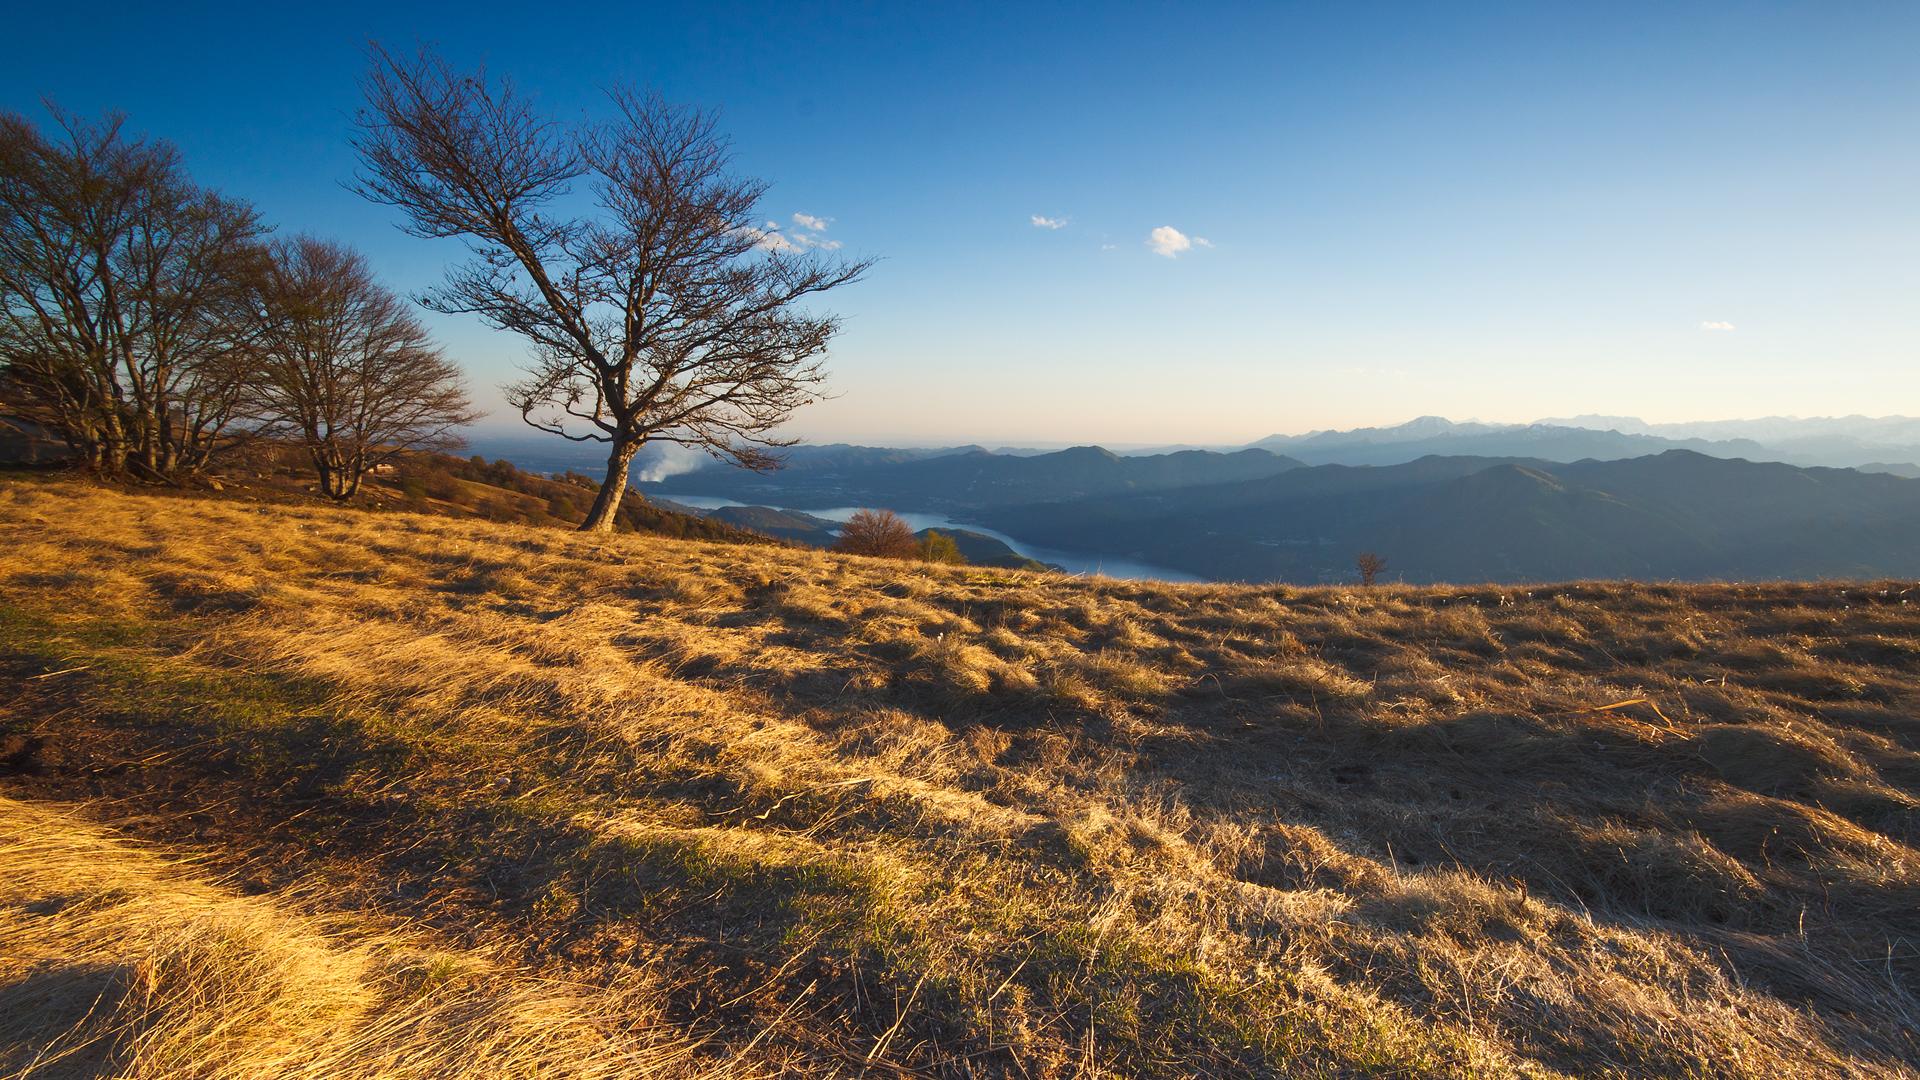 Mottarone Western Alps Italy Hd Desktop Wallpaper 100564 HD Wallpaper 1920x1080